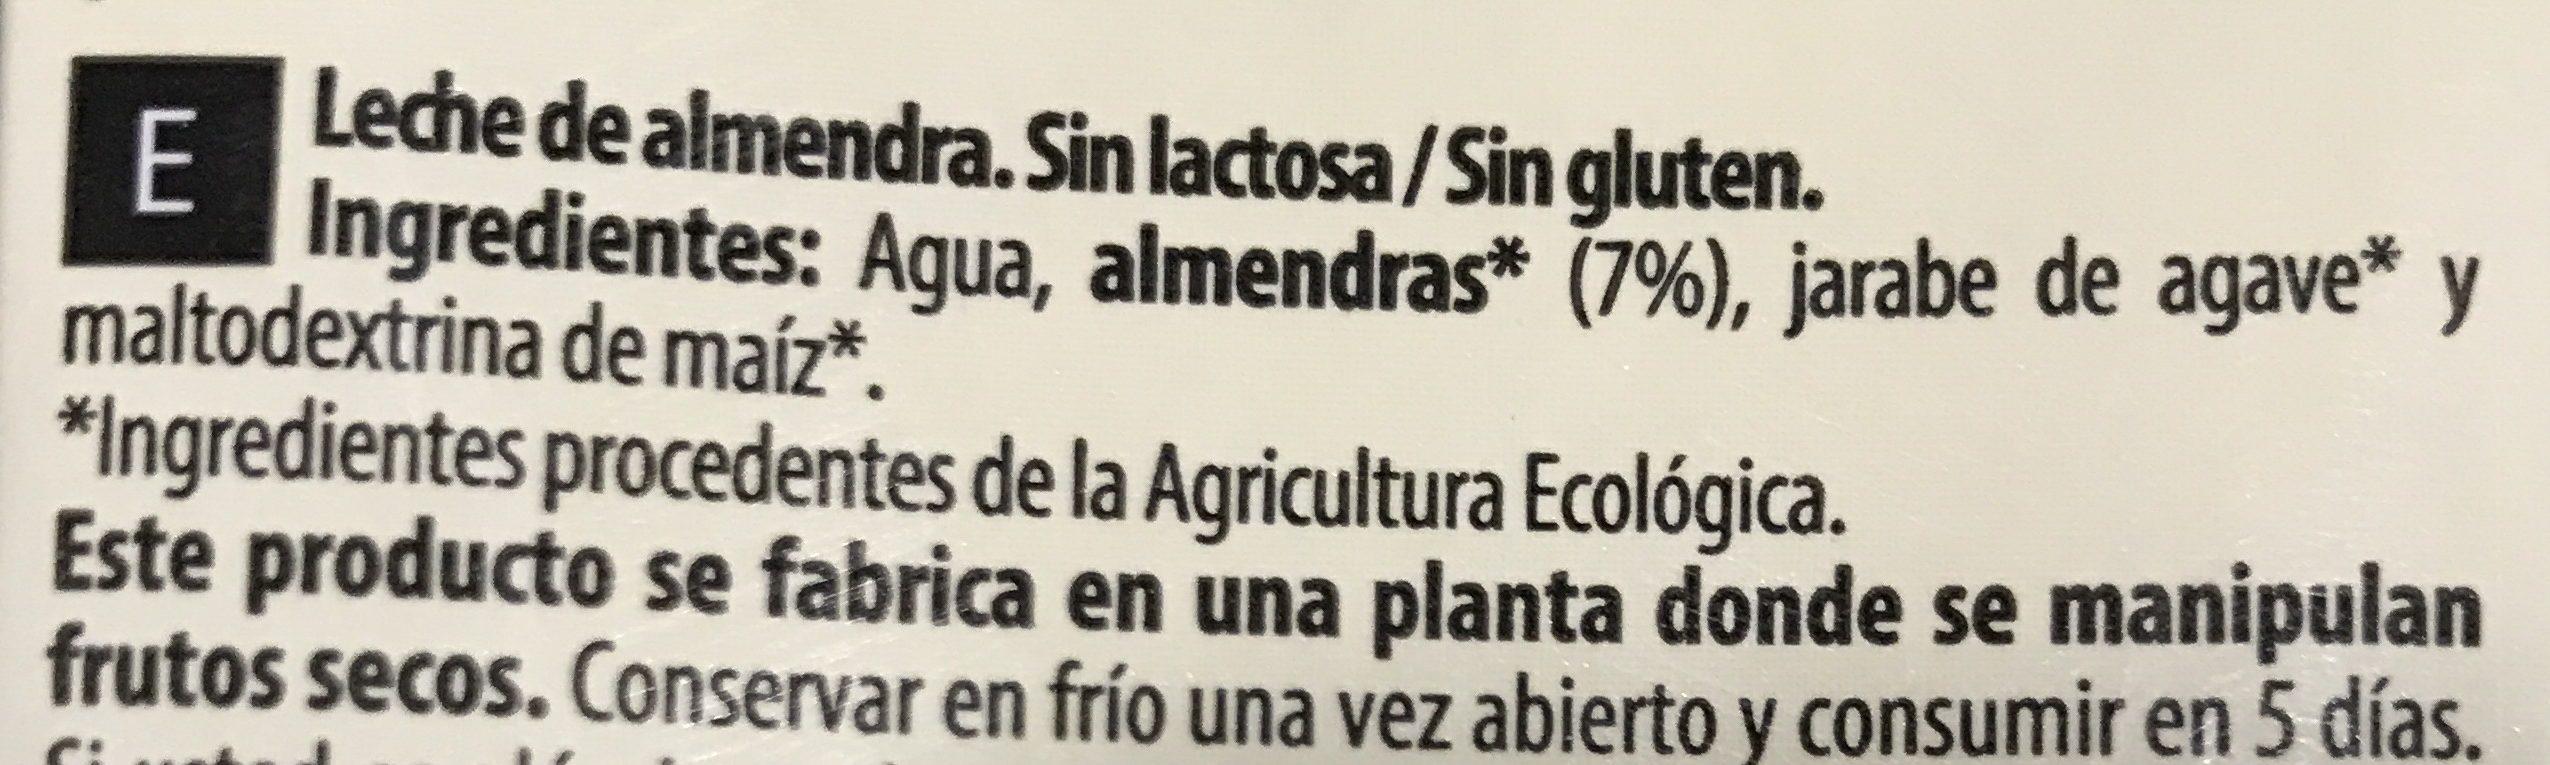 Bebida Almendra Original - Ingredientes